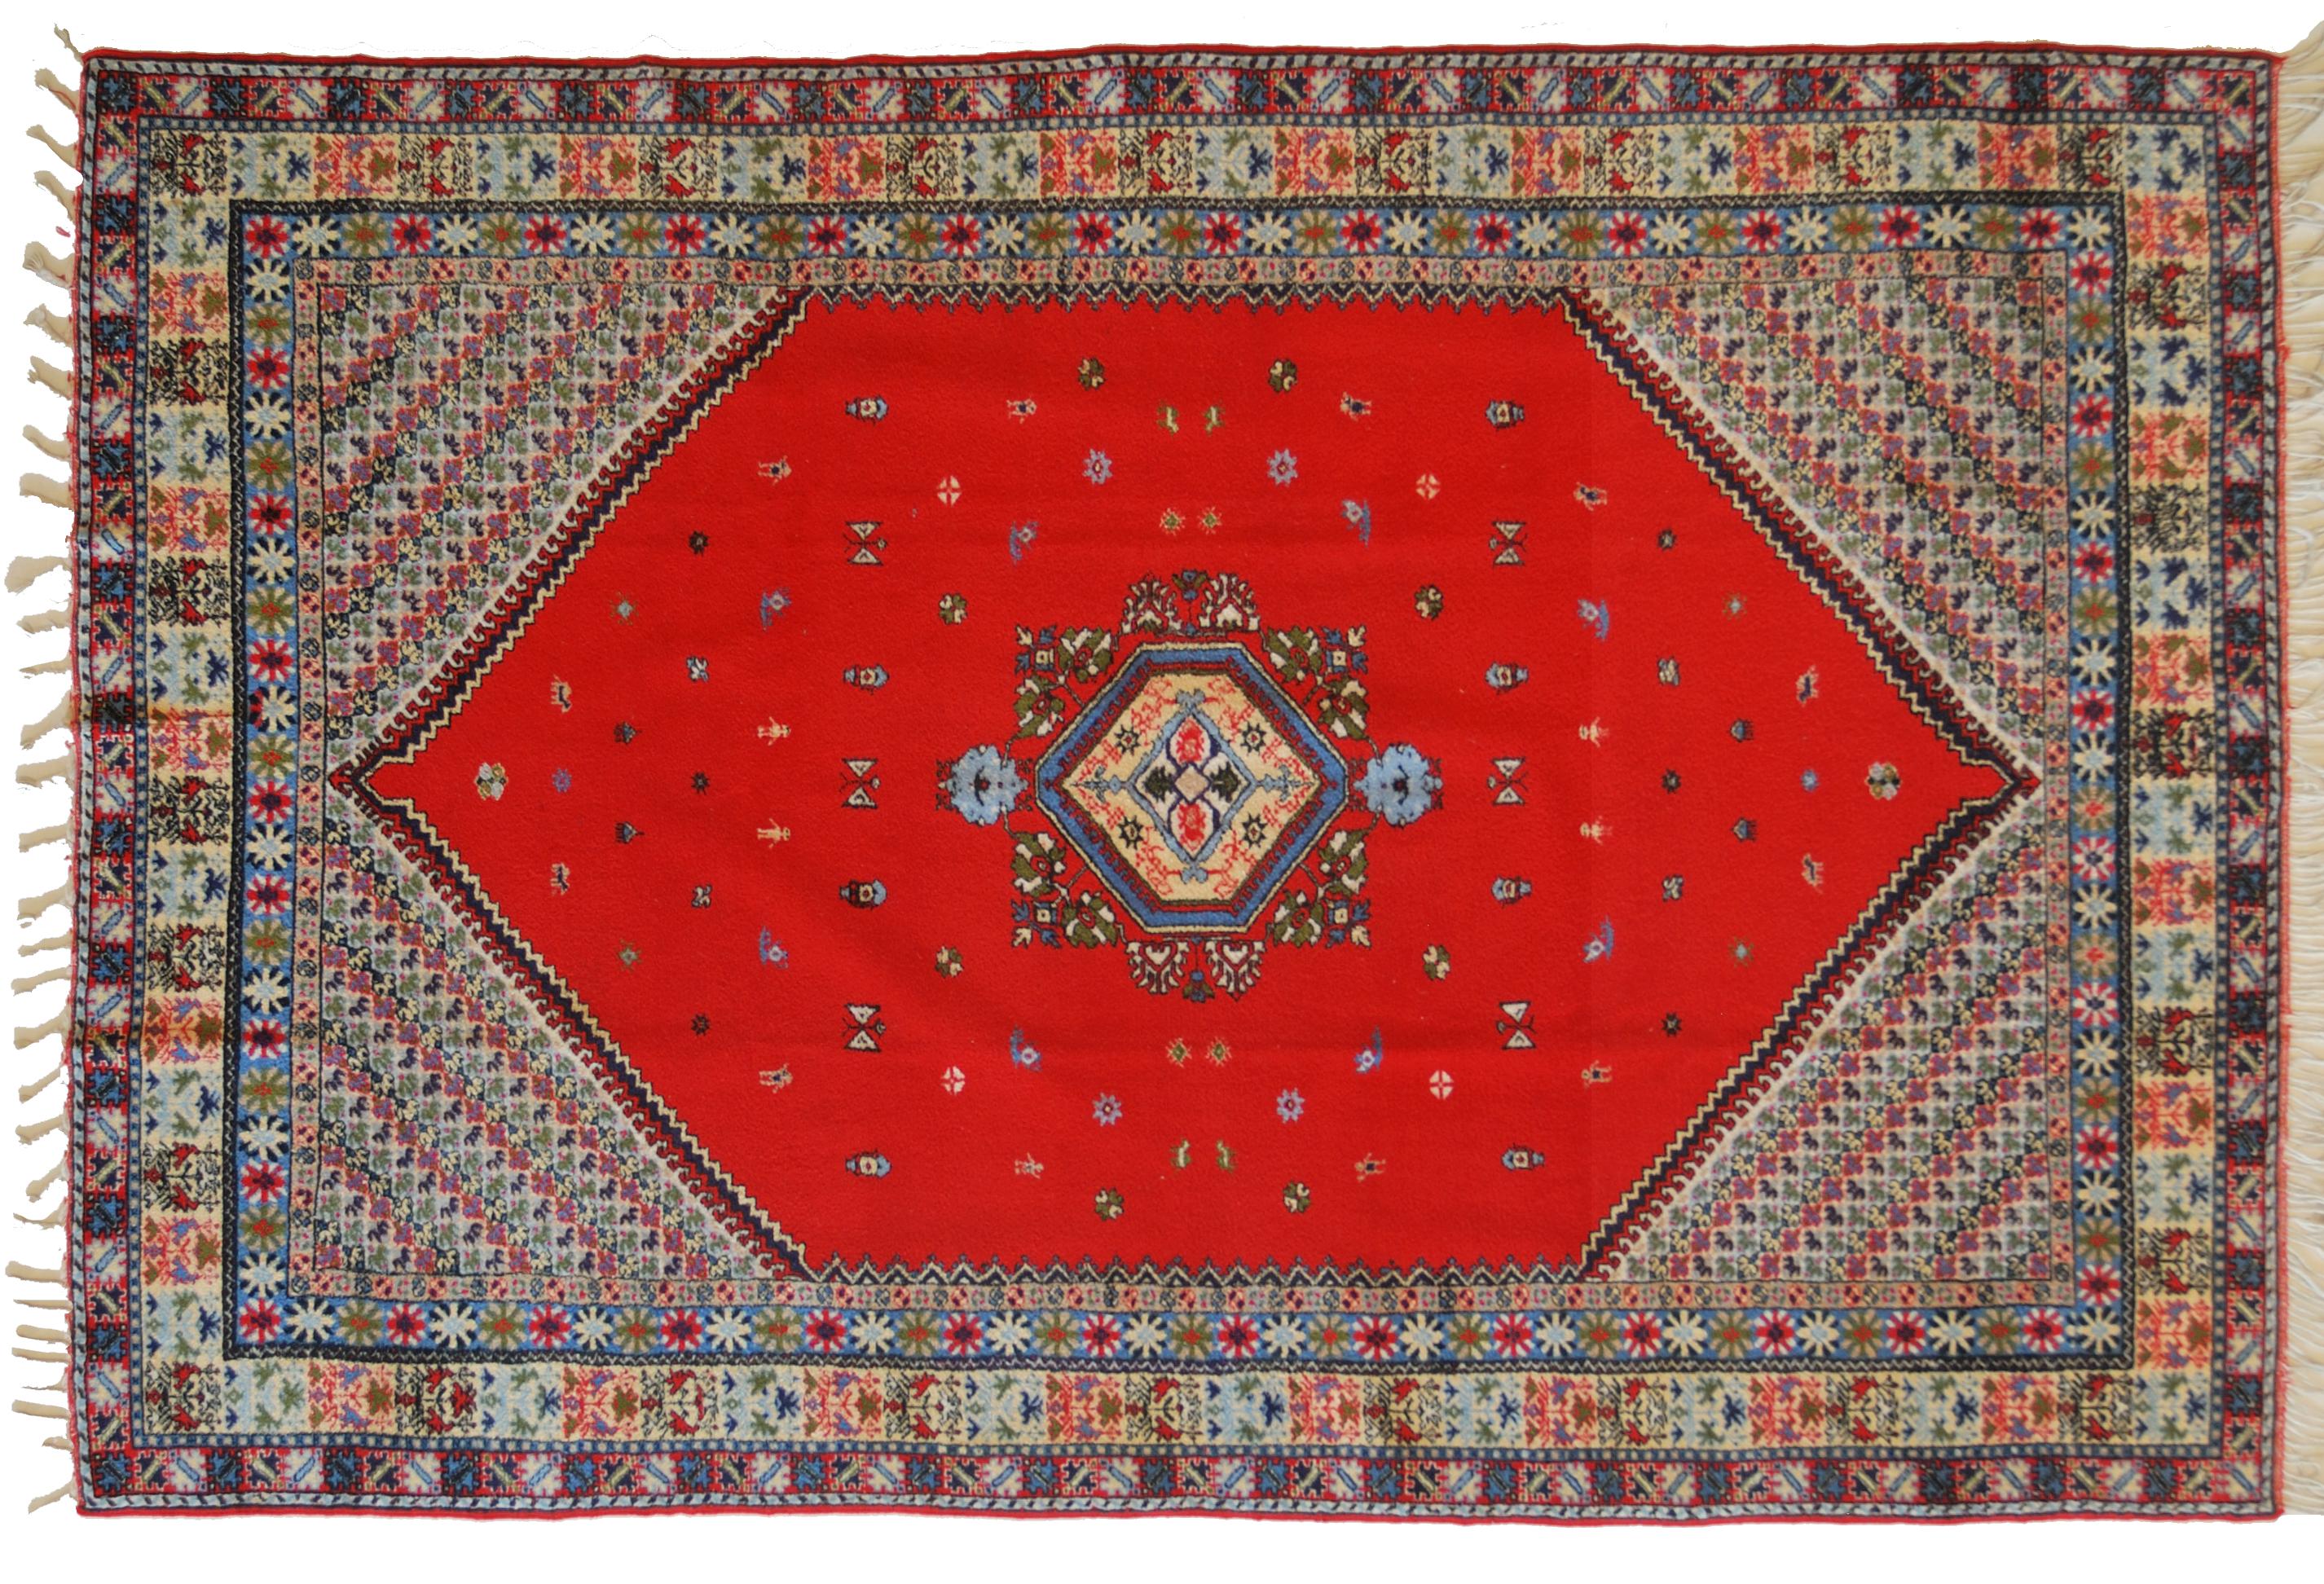 Tappeti Kilim Marocco : Tappeto marocco rosso. morandi tappeti